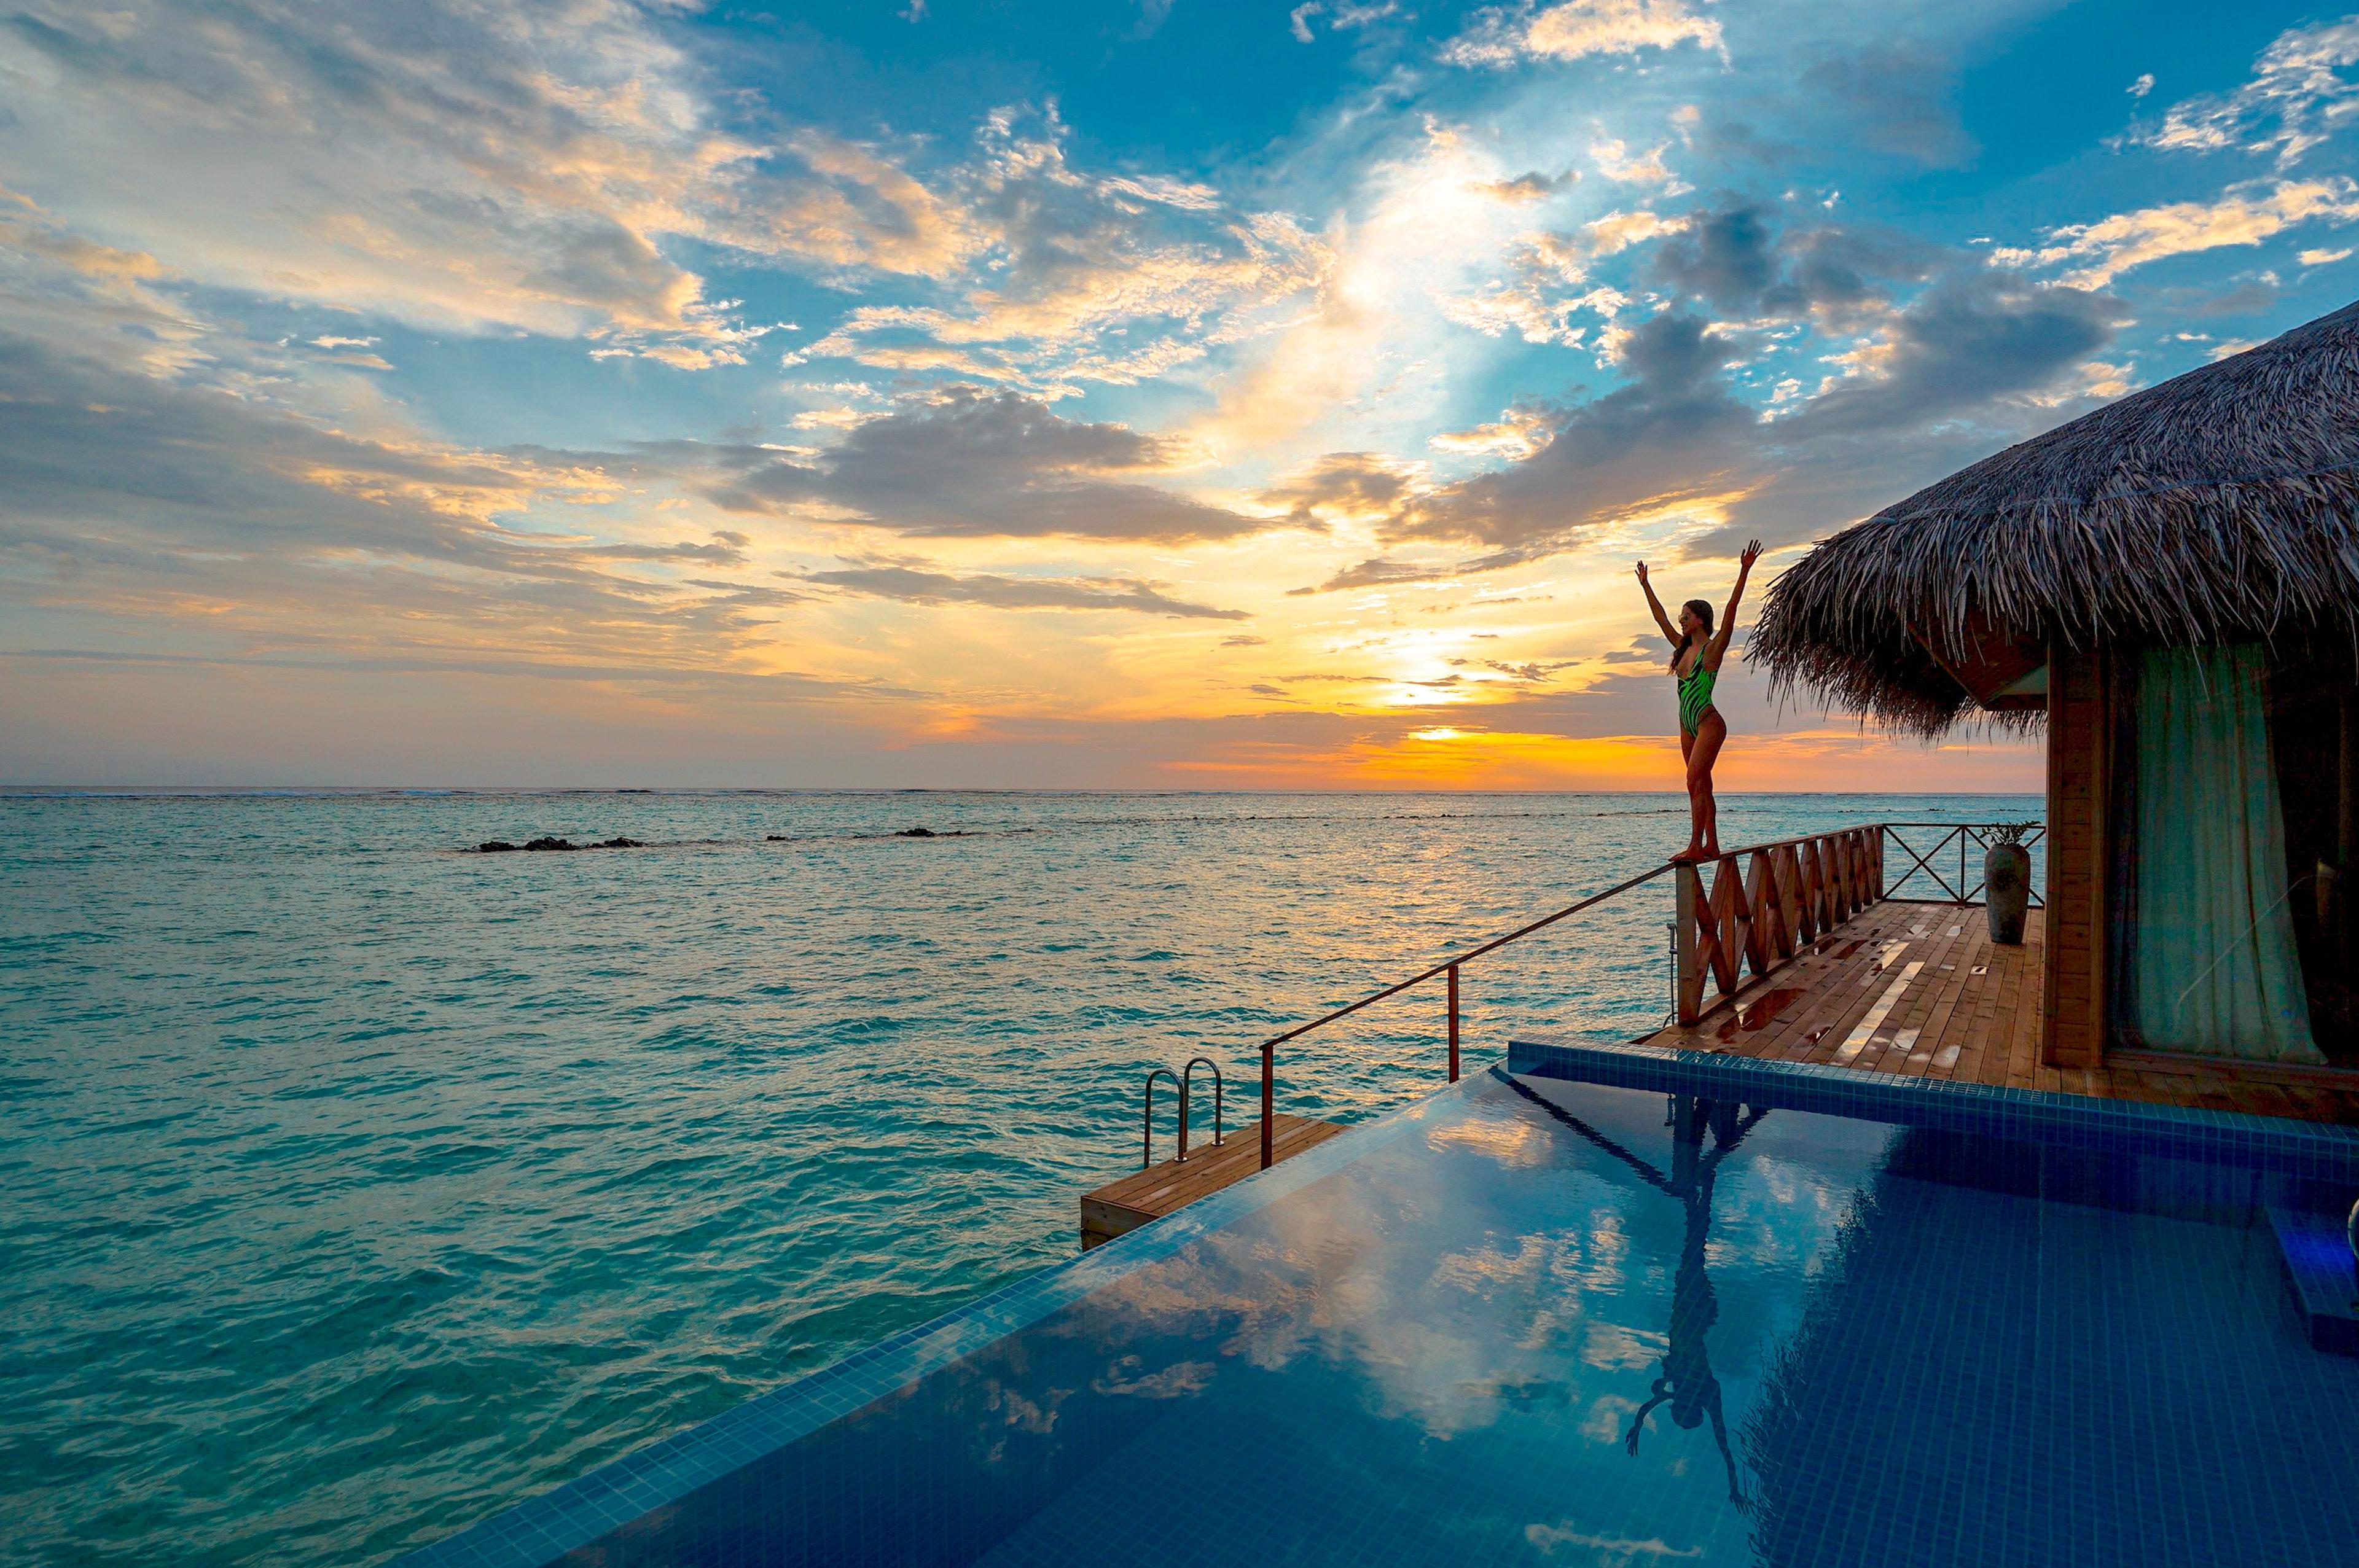 The Westin Dubai Mina Seyahi Beach Resort, Most Family-Friendly Hotels in Dubai